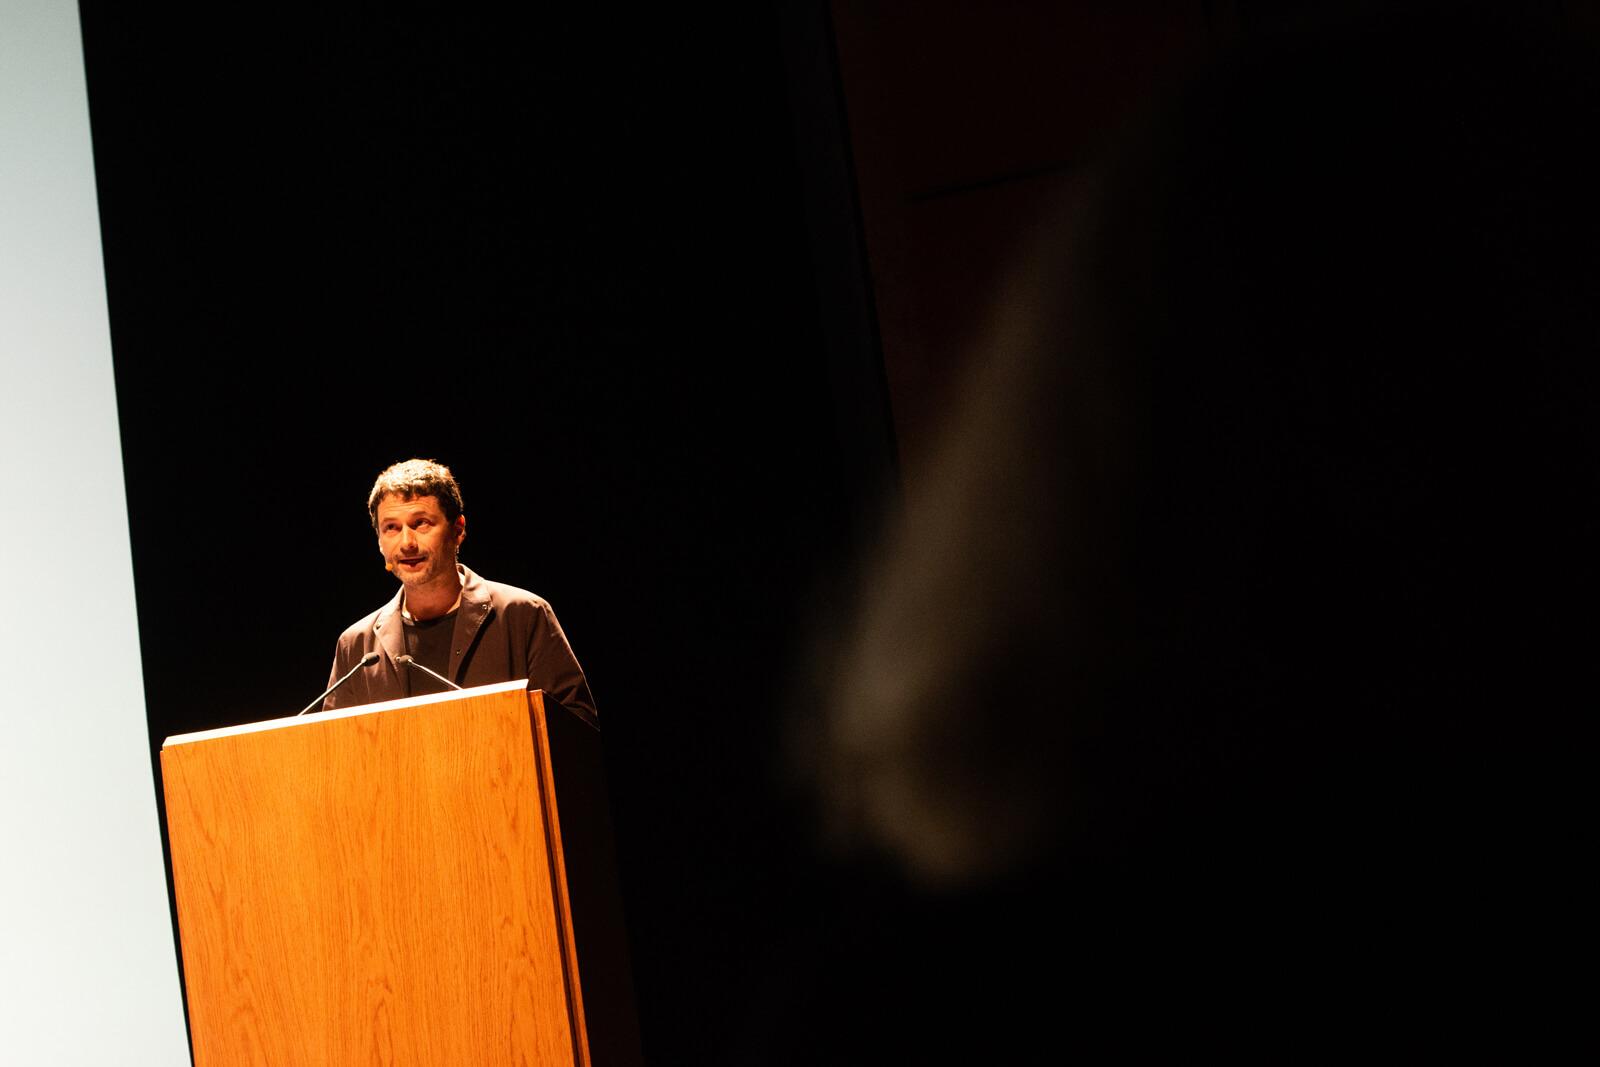 Ed Keller apresenta a conferência